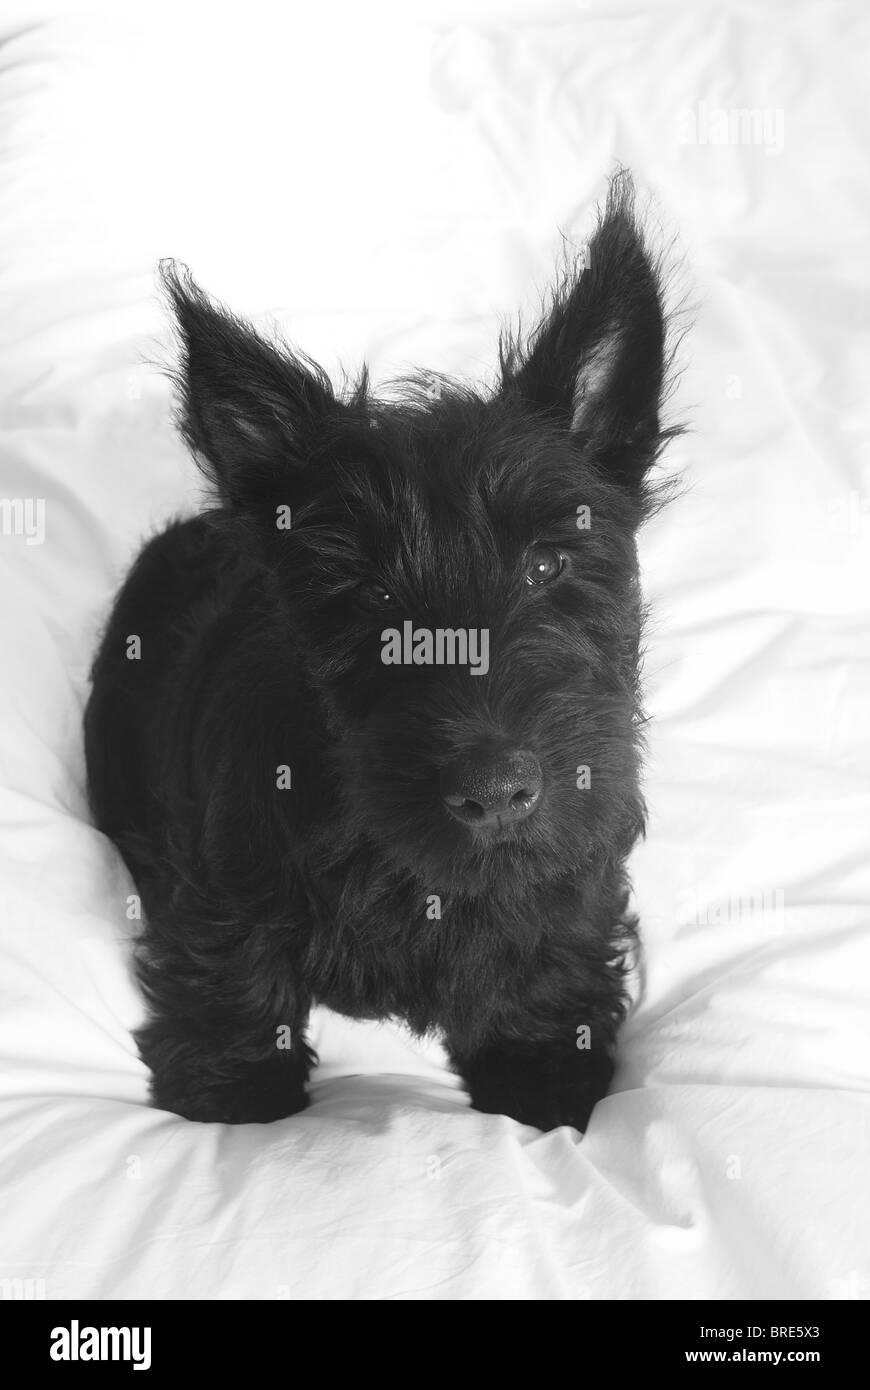 black scottie dog stock photos black scottie dog stock images alamy